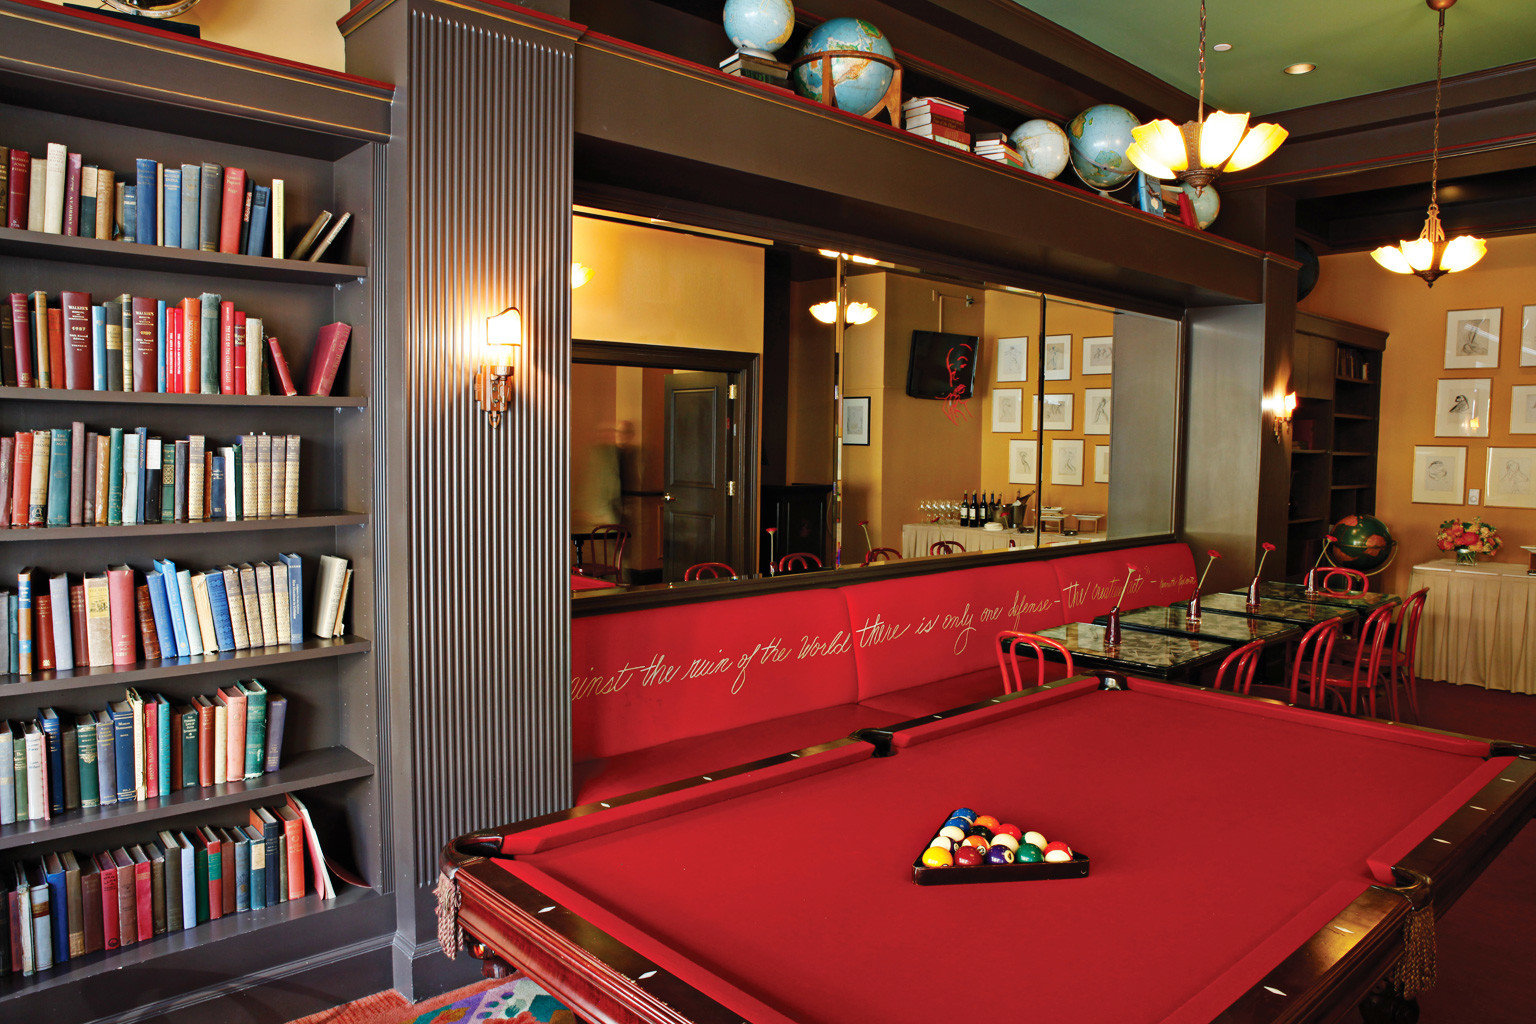 Boutique Historic Sport shelf book recreation room billiard room scene games set